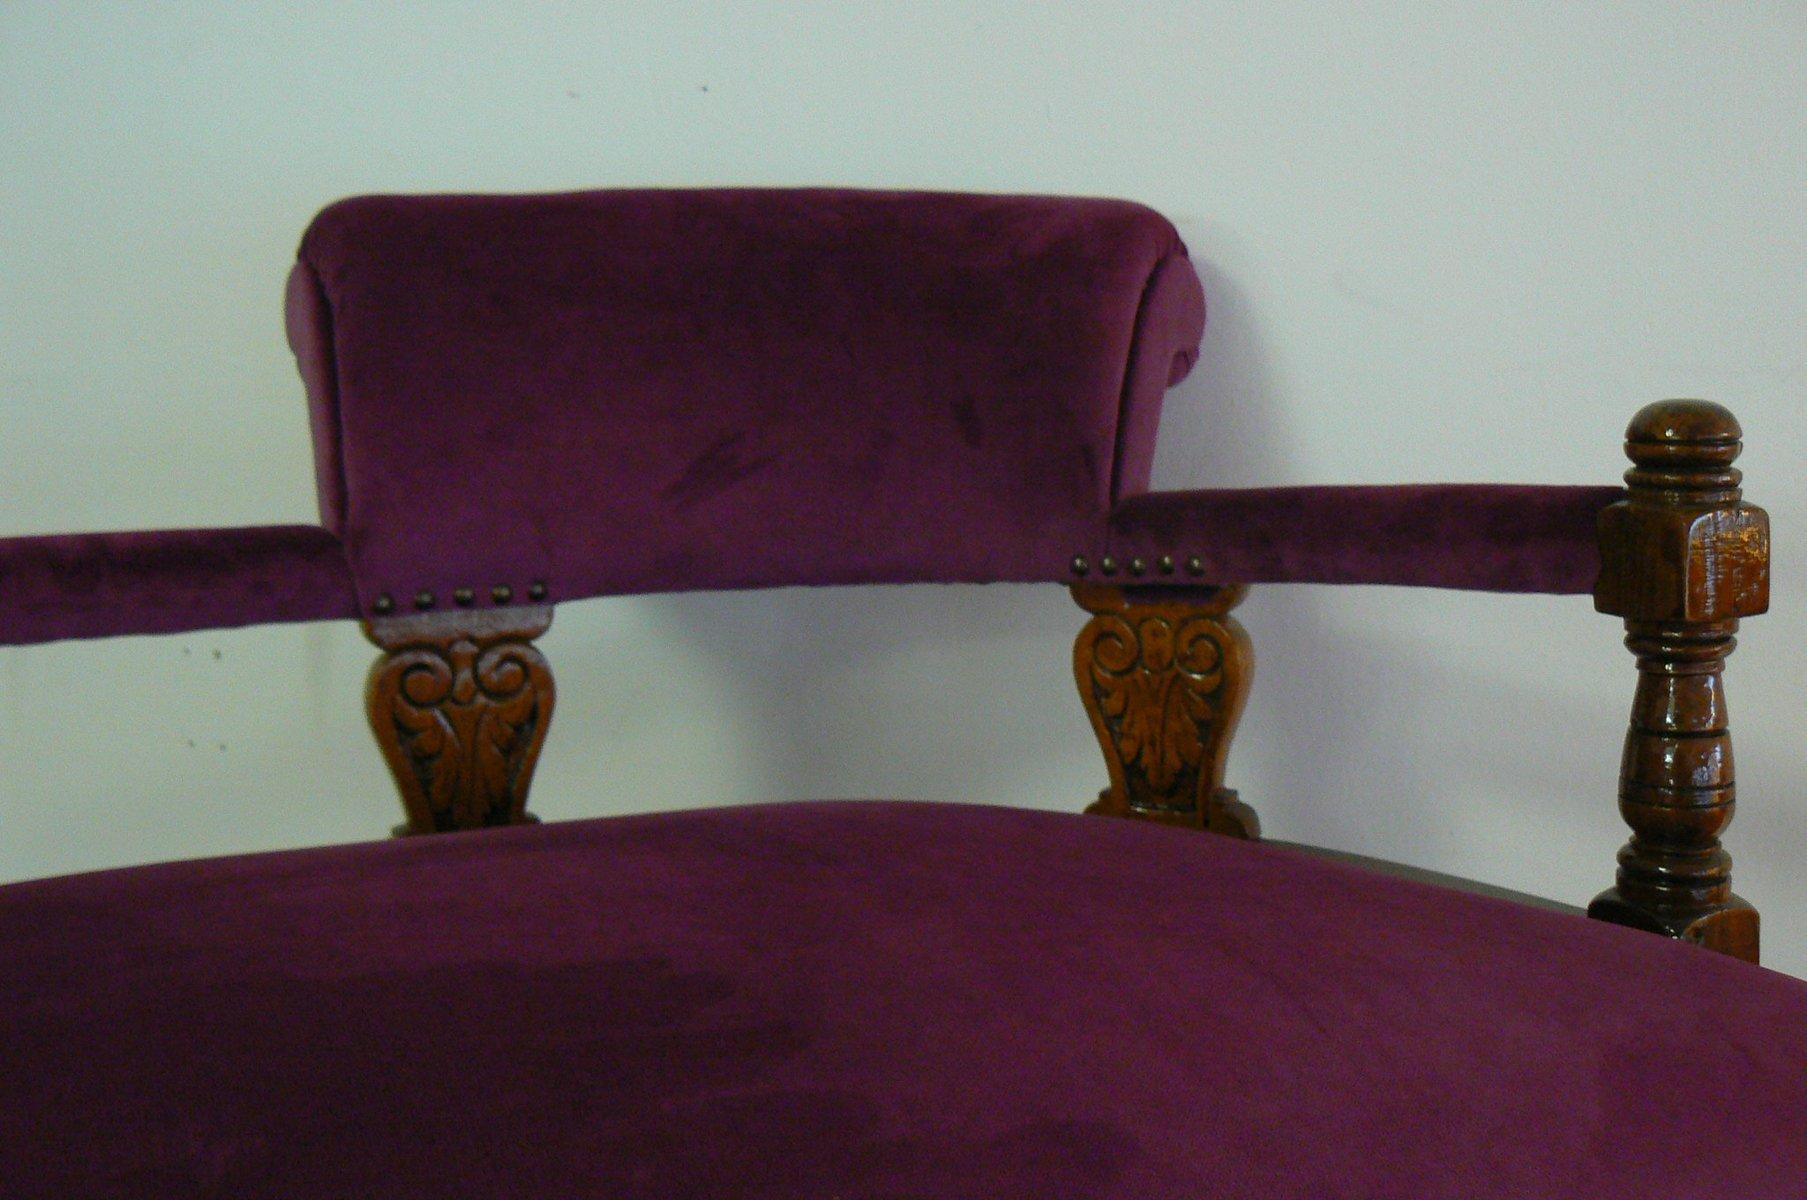 Beautiful Chaise Longue Prezzi Bassi Images - Idee Per Una Casa ...